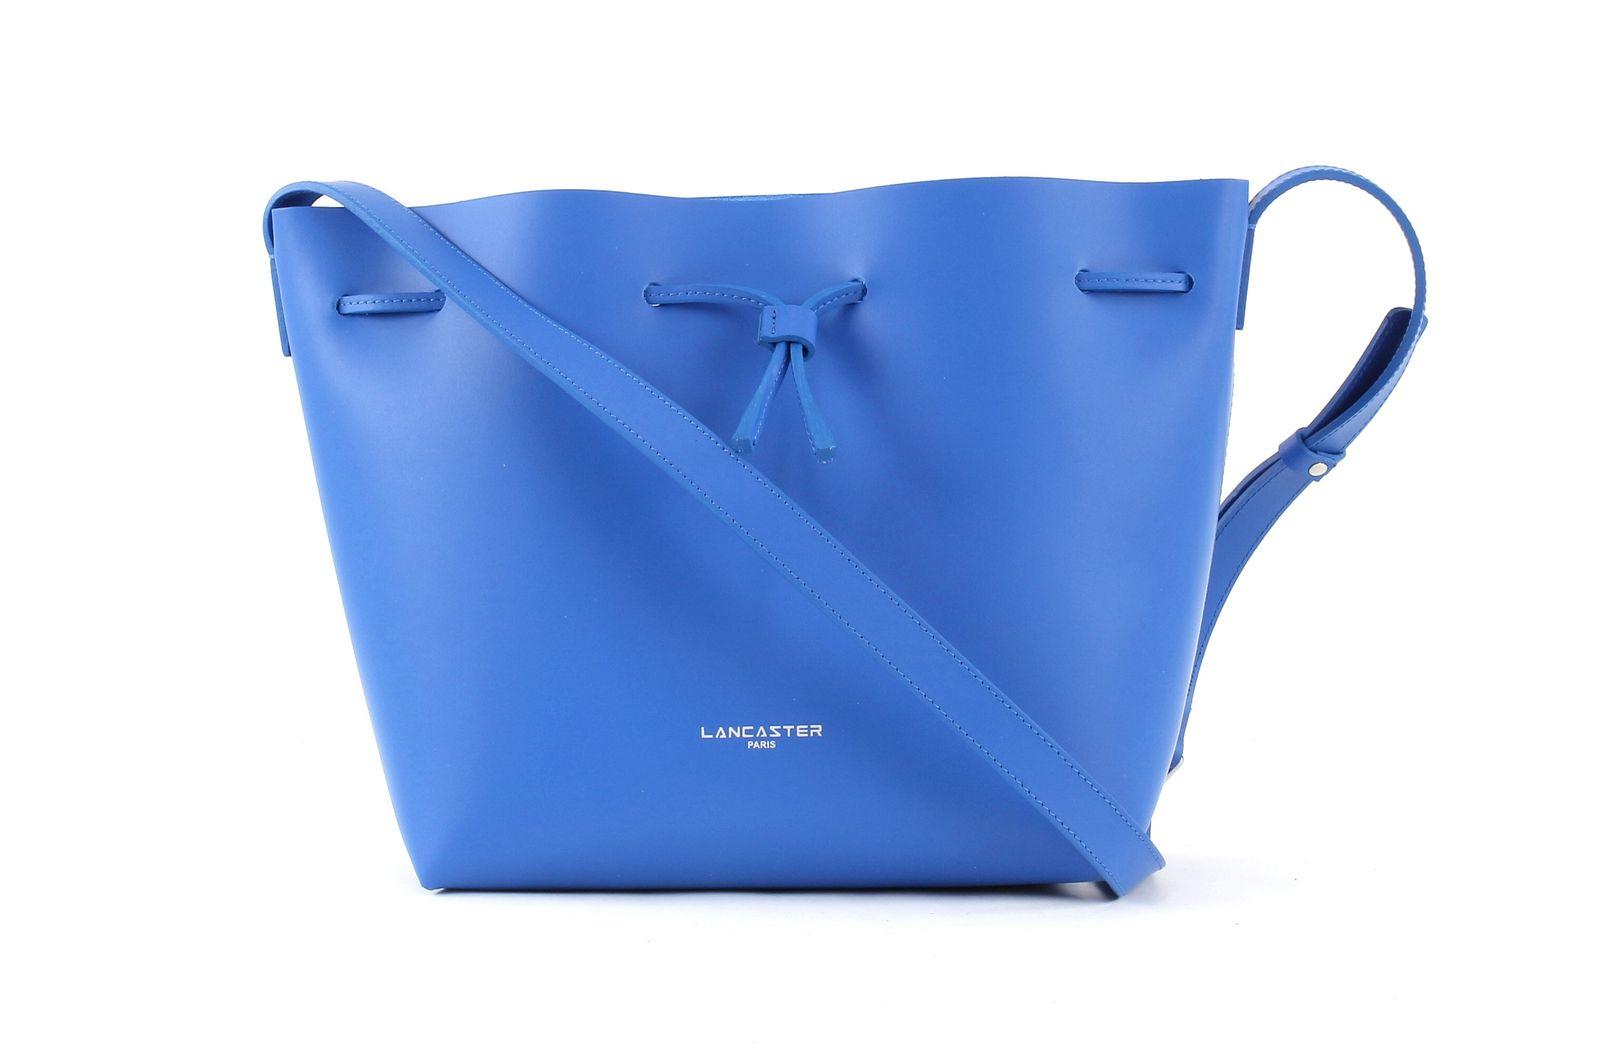 LANCASTER Pur Smooth Bucket Bag S Bleu Cyan